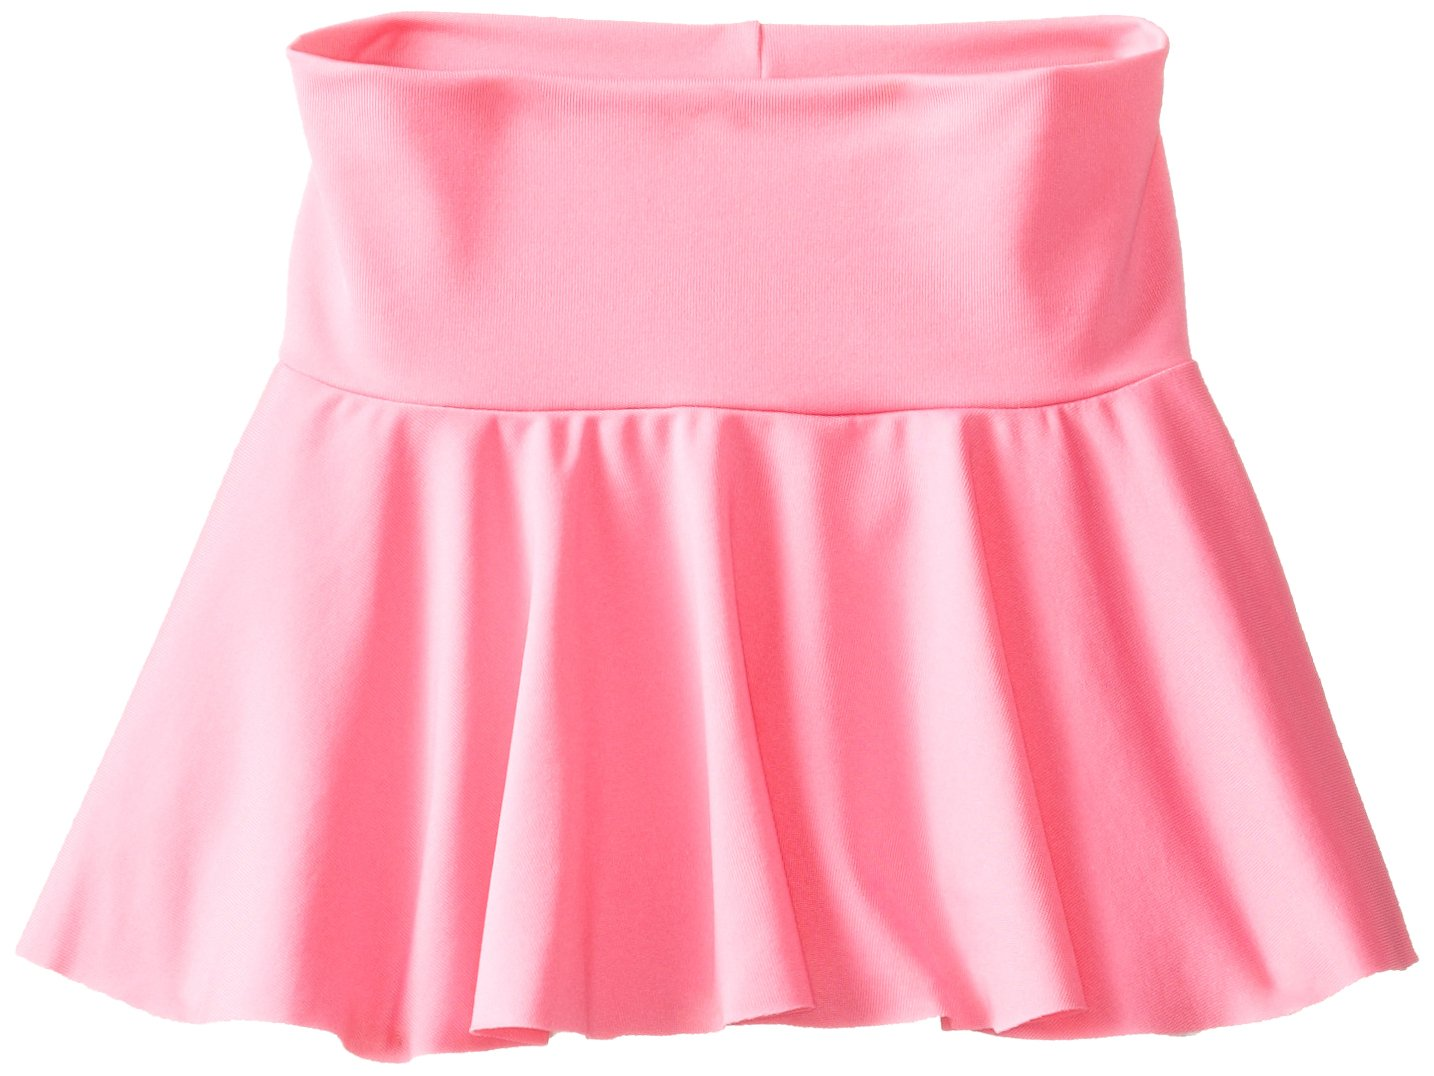 Clementine Little Girls' Microfiber Pull-On Skirt Clementine Girls 2-6X MG0117